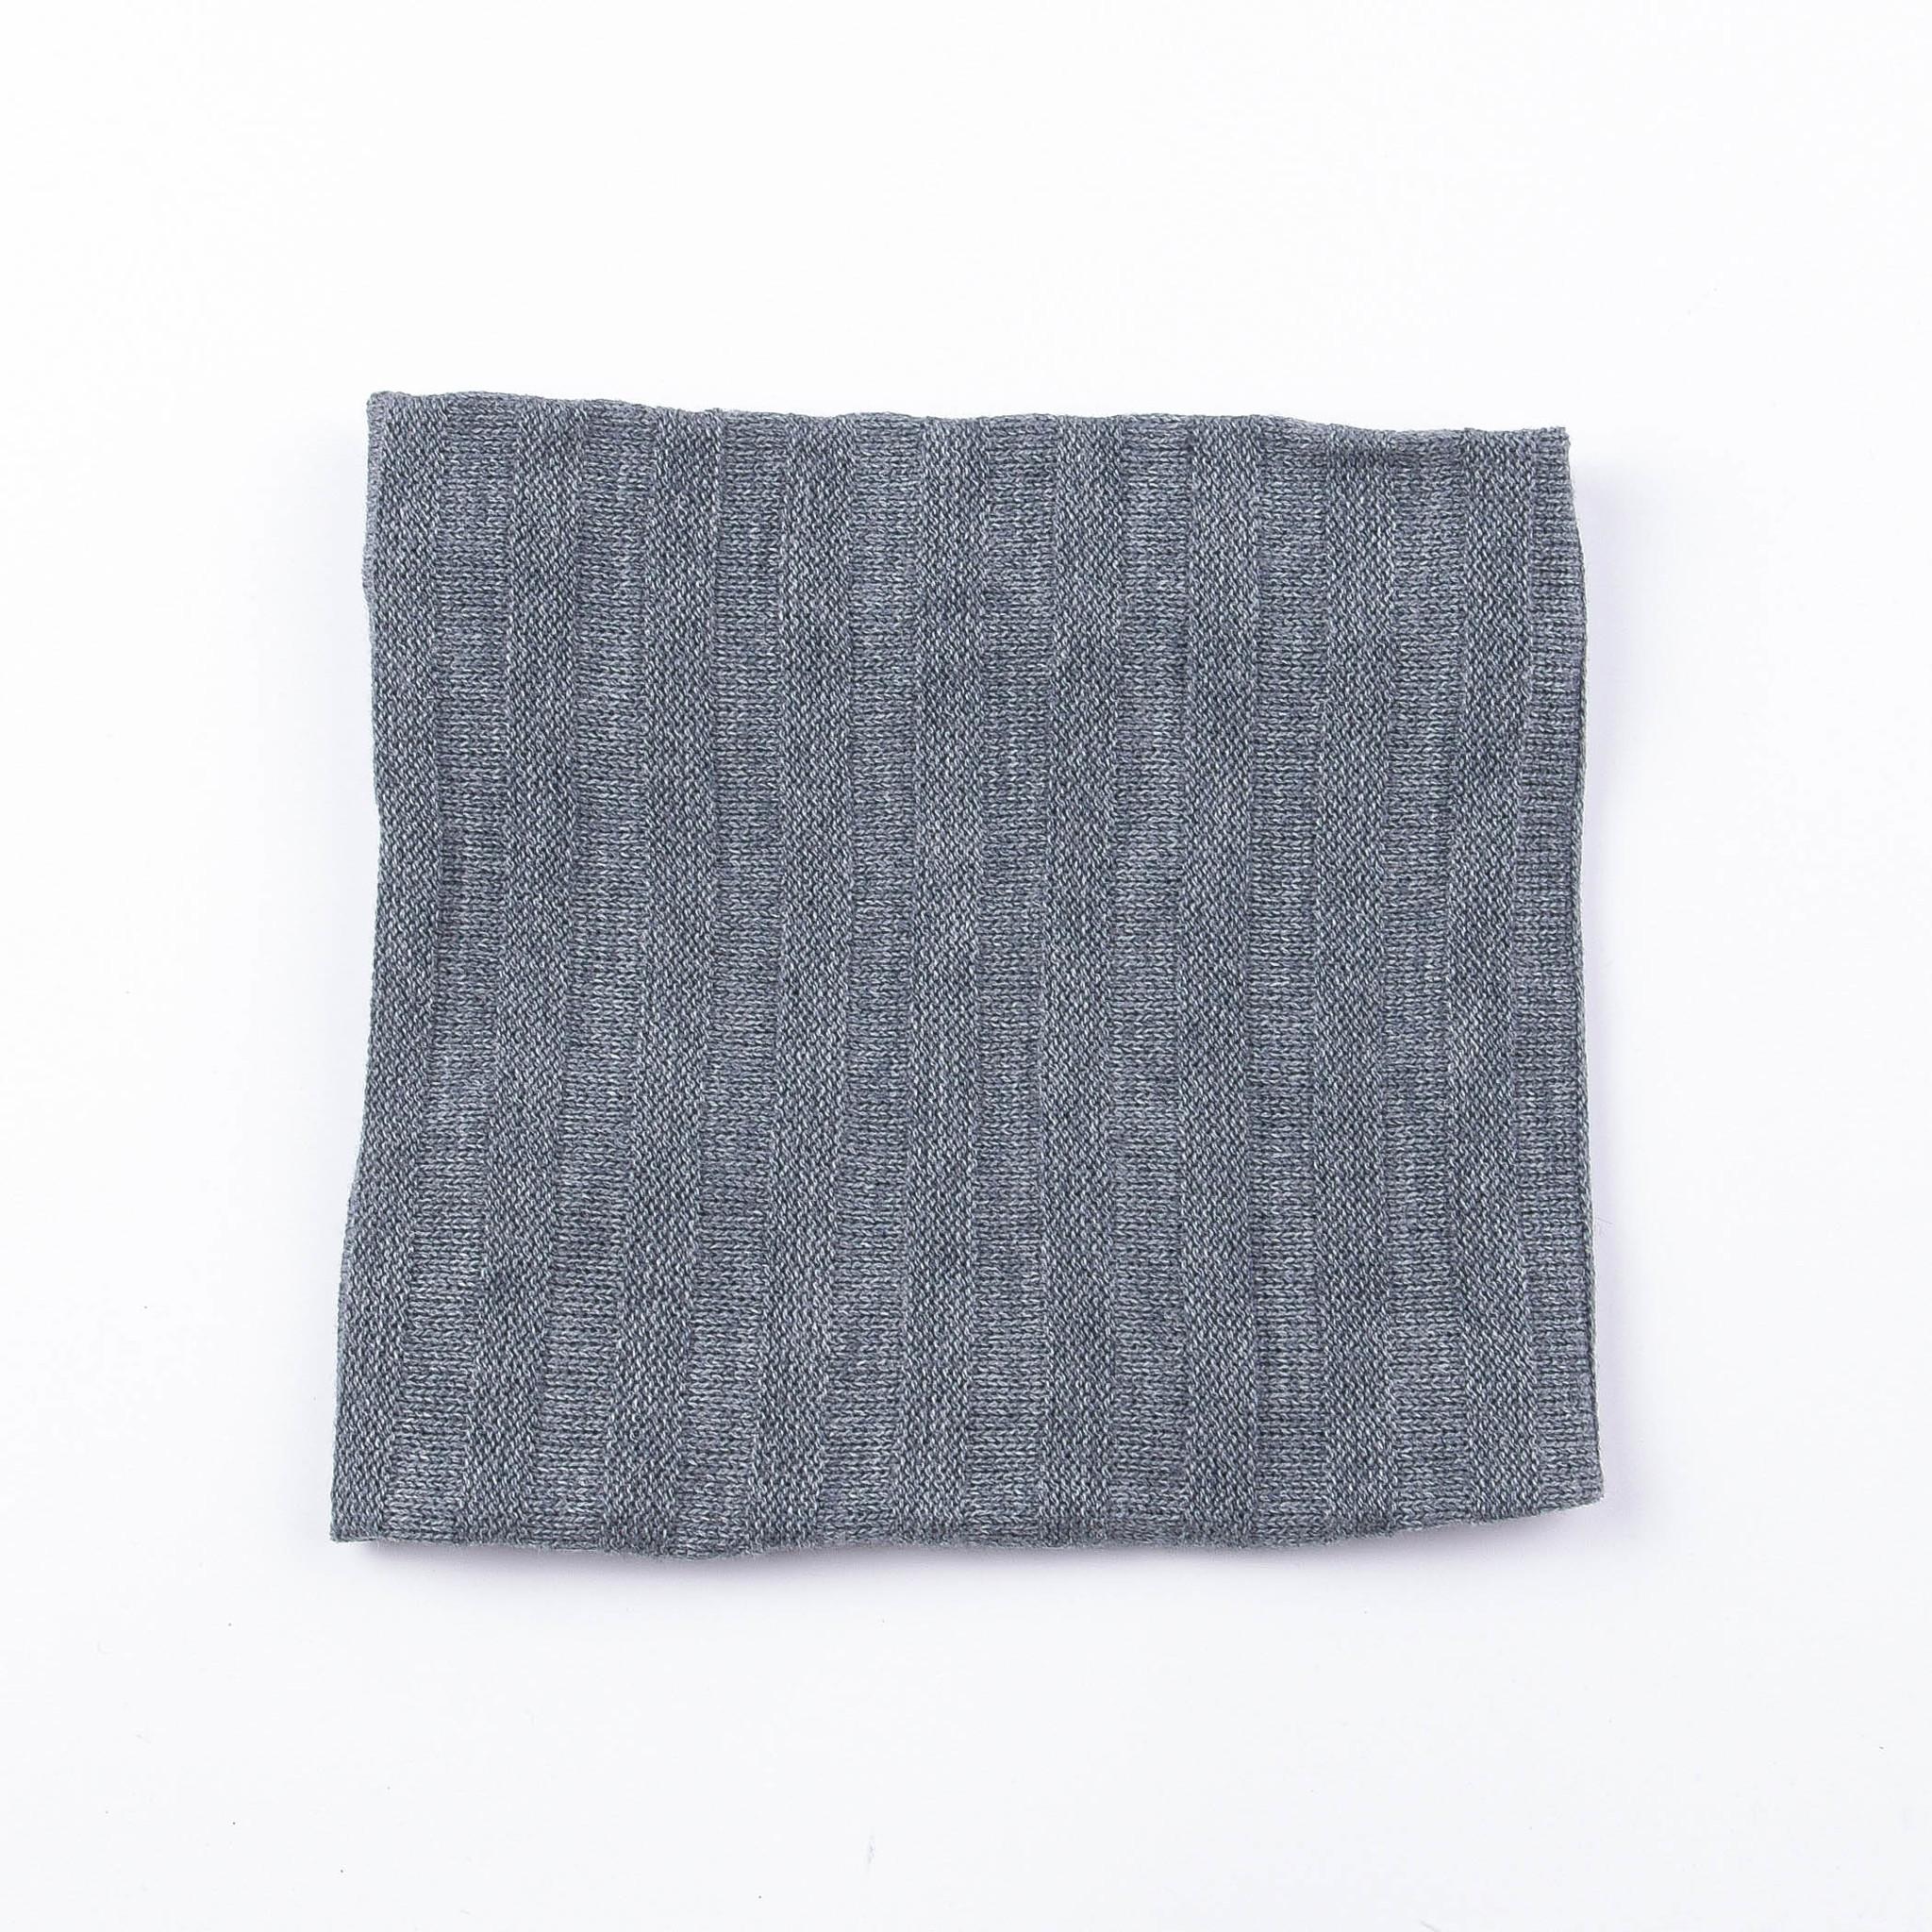 Knitted snood - Graphite Melange